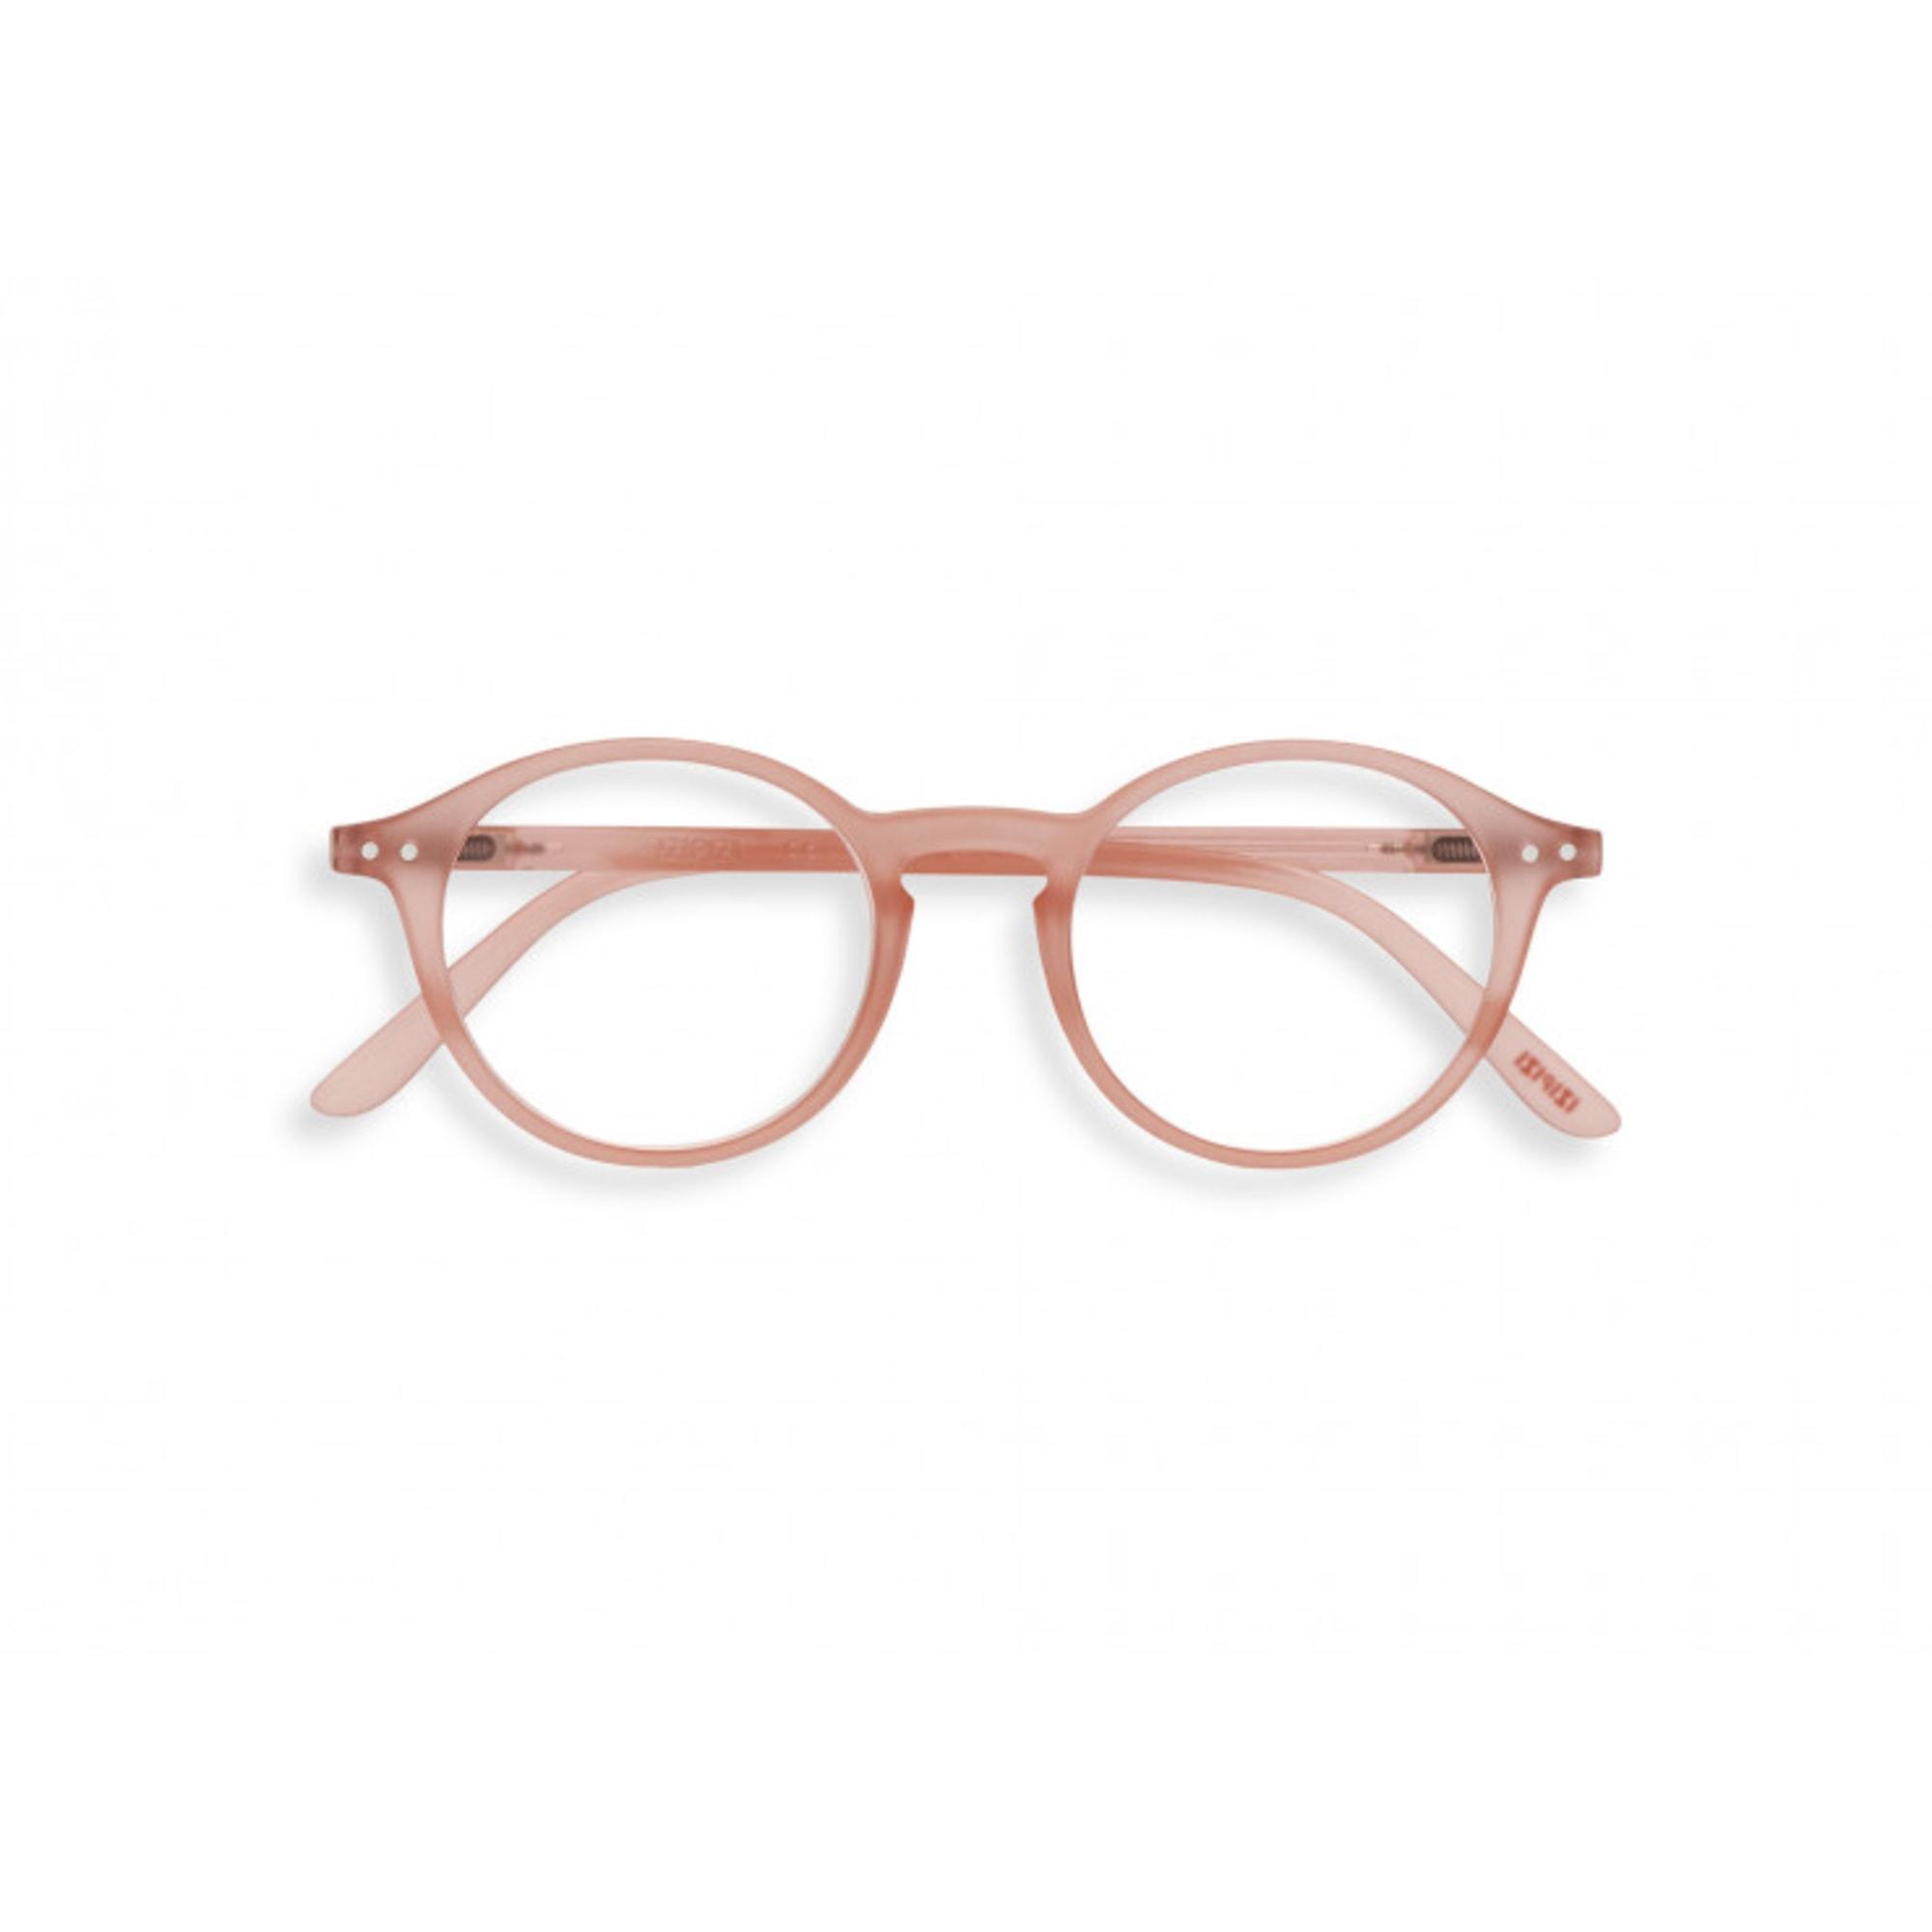 Monture de lunettes IZIPIZI Rose, fuschia, vieux rose